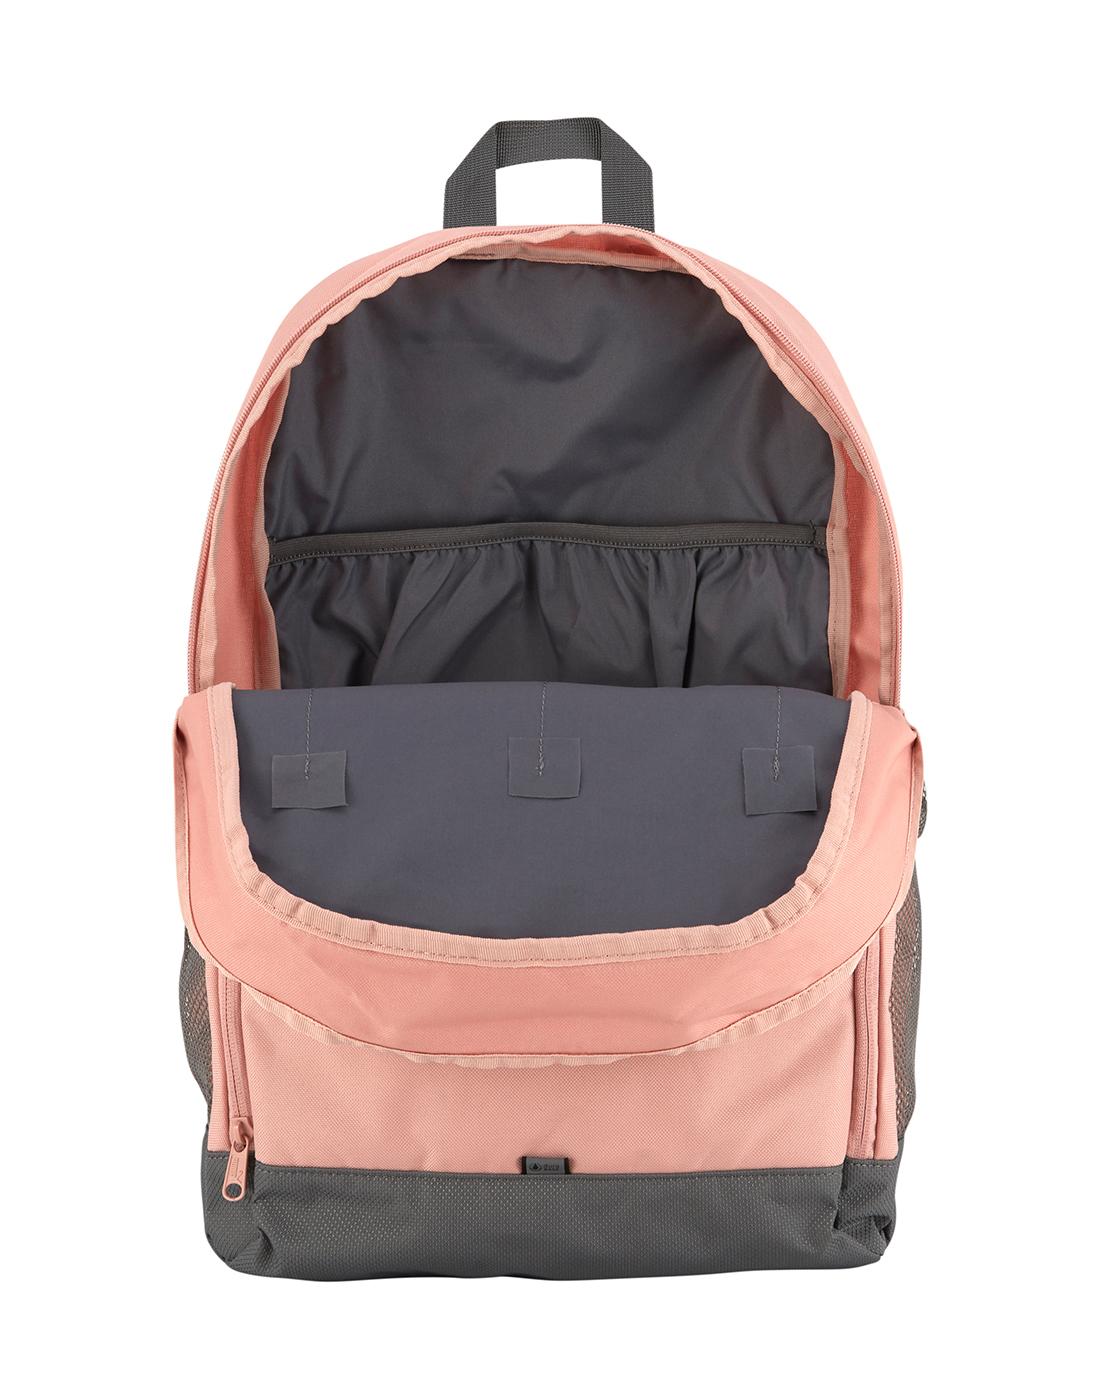 pink puma school bag life style sports